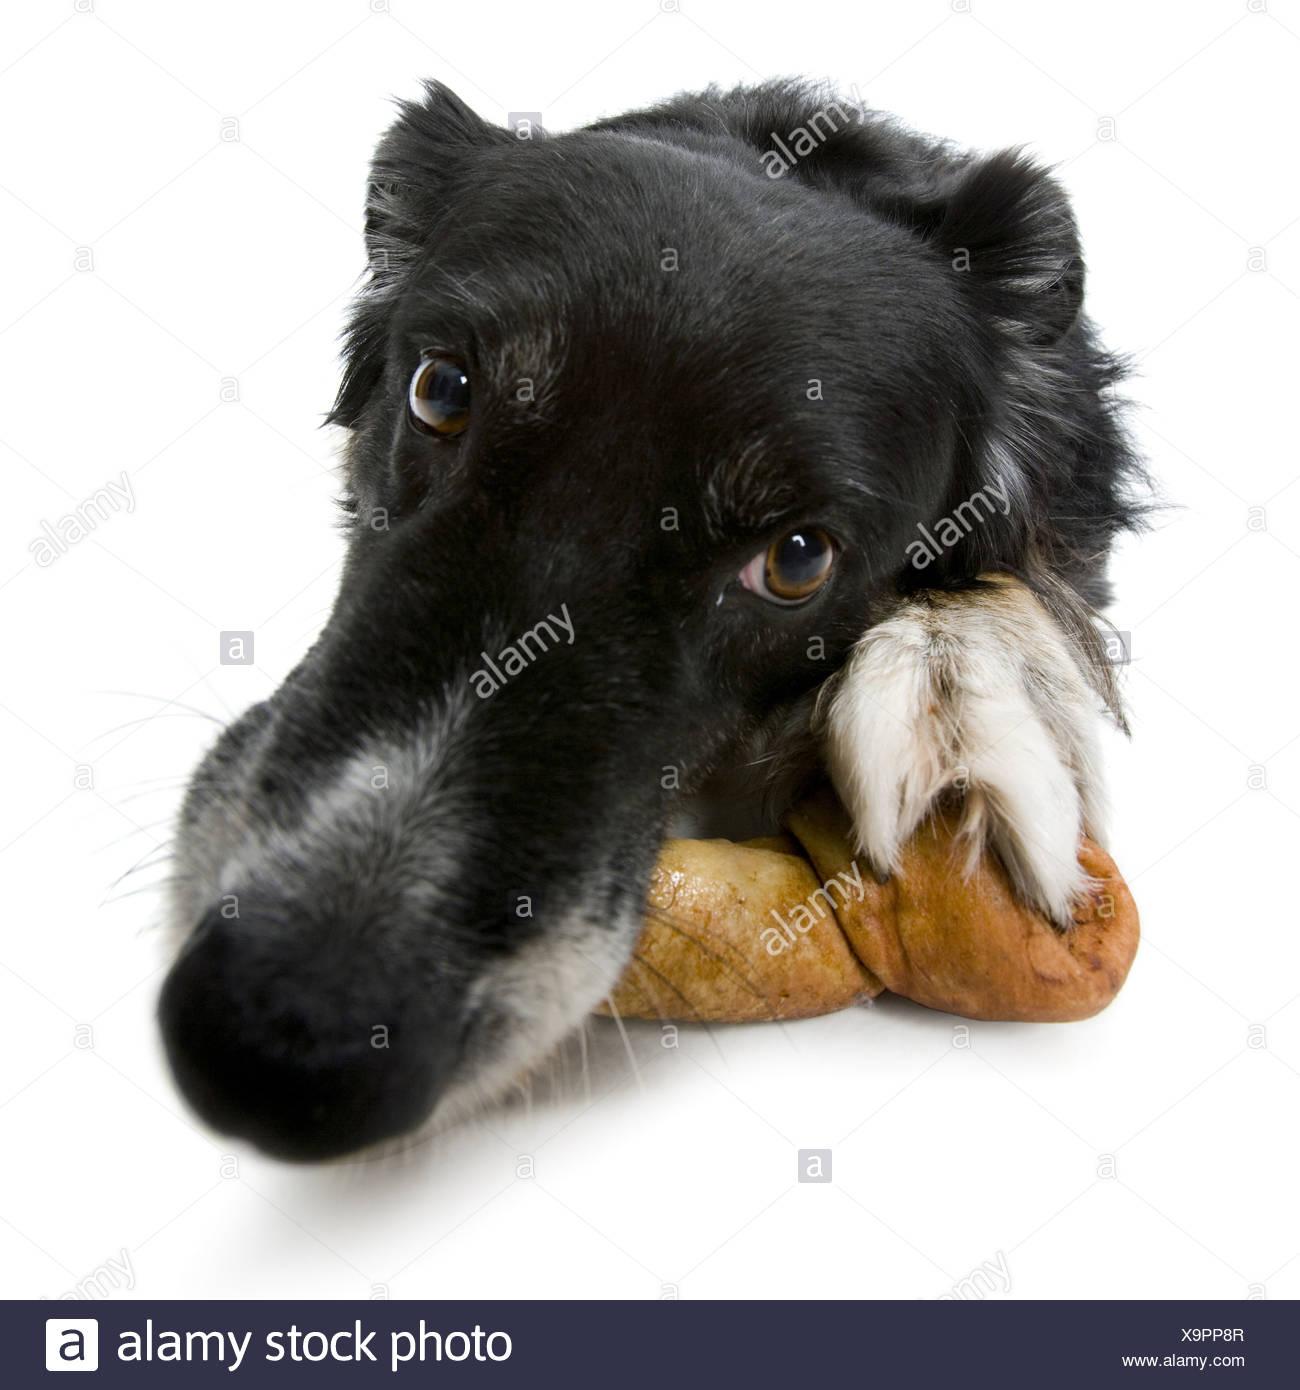 Close up of a dog lying with a dog bone - Stock Image